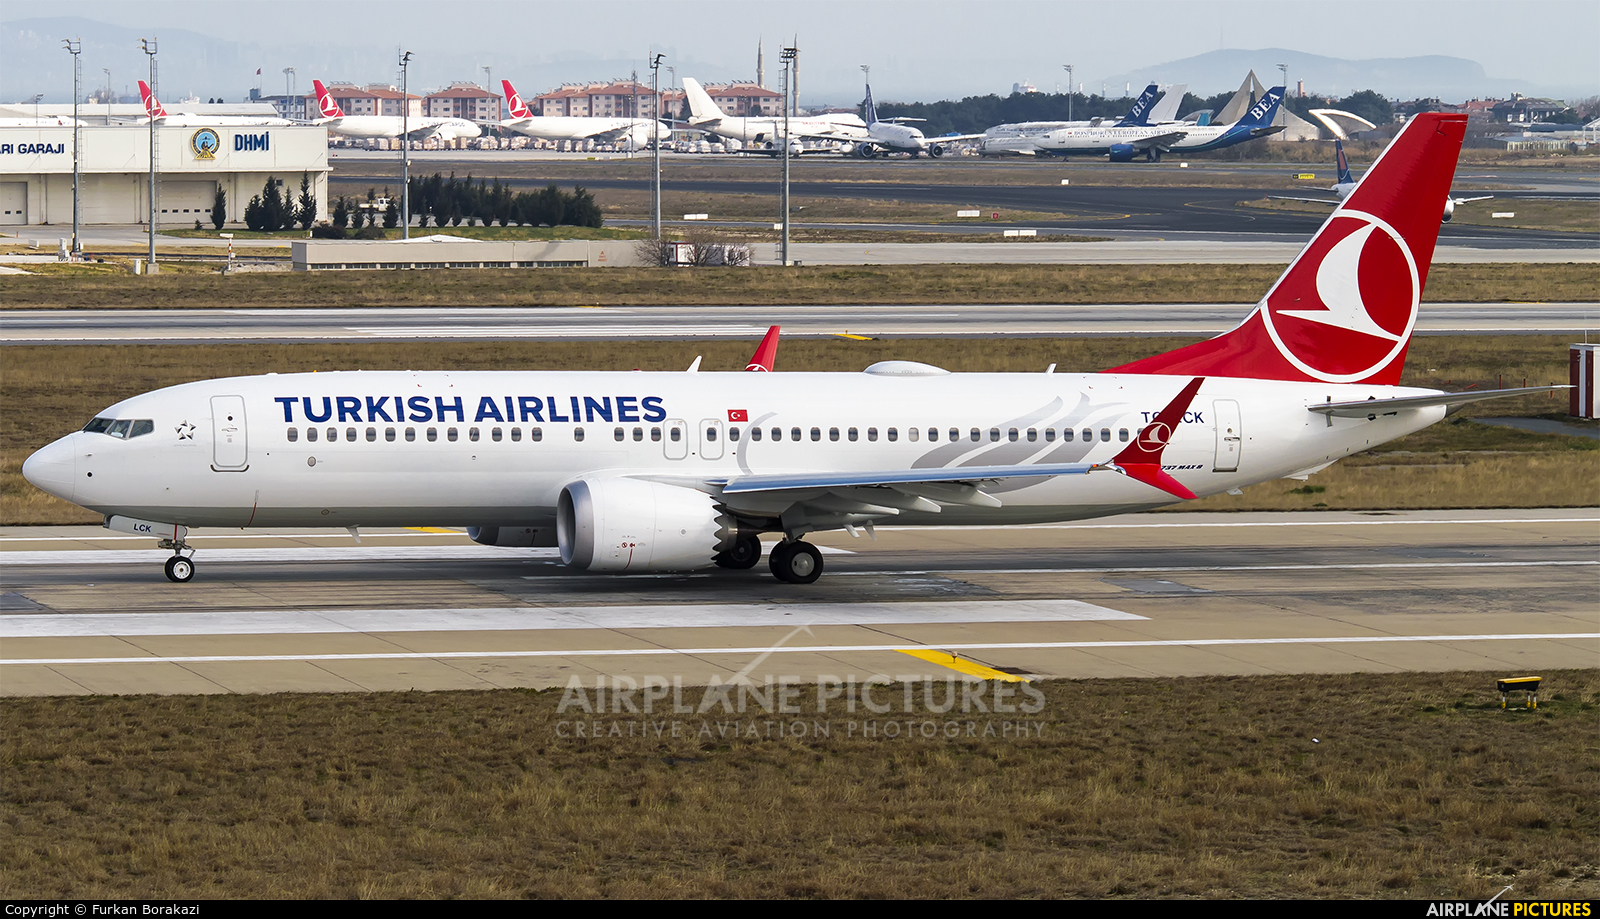 Turkish Airlines TC-LCK aircraft at Istanbul - Ataturk